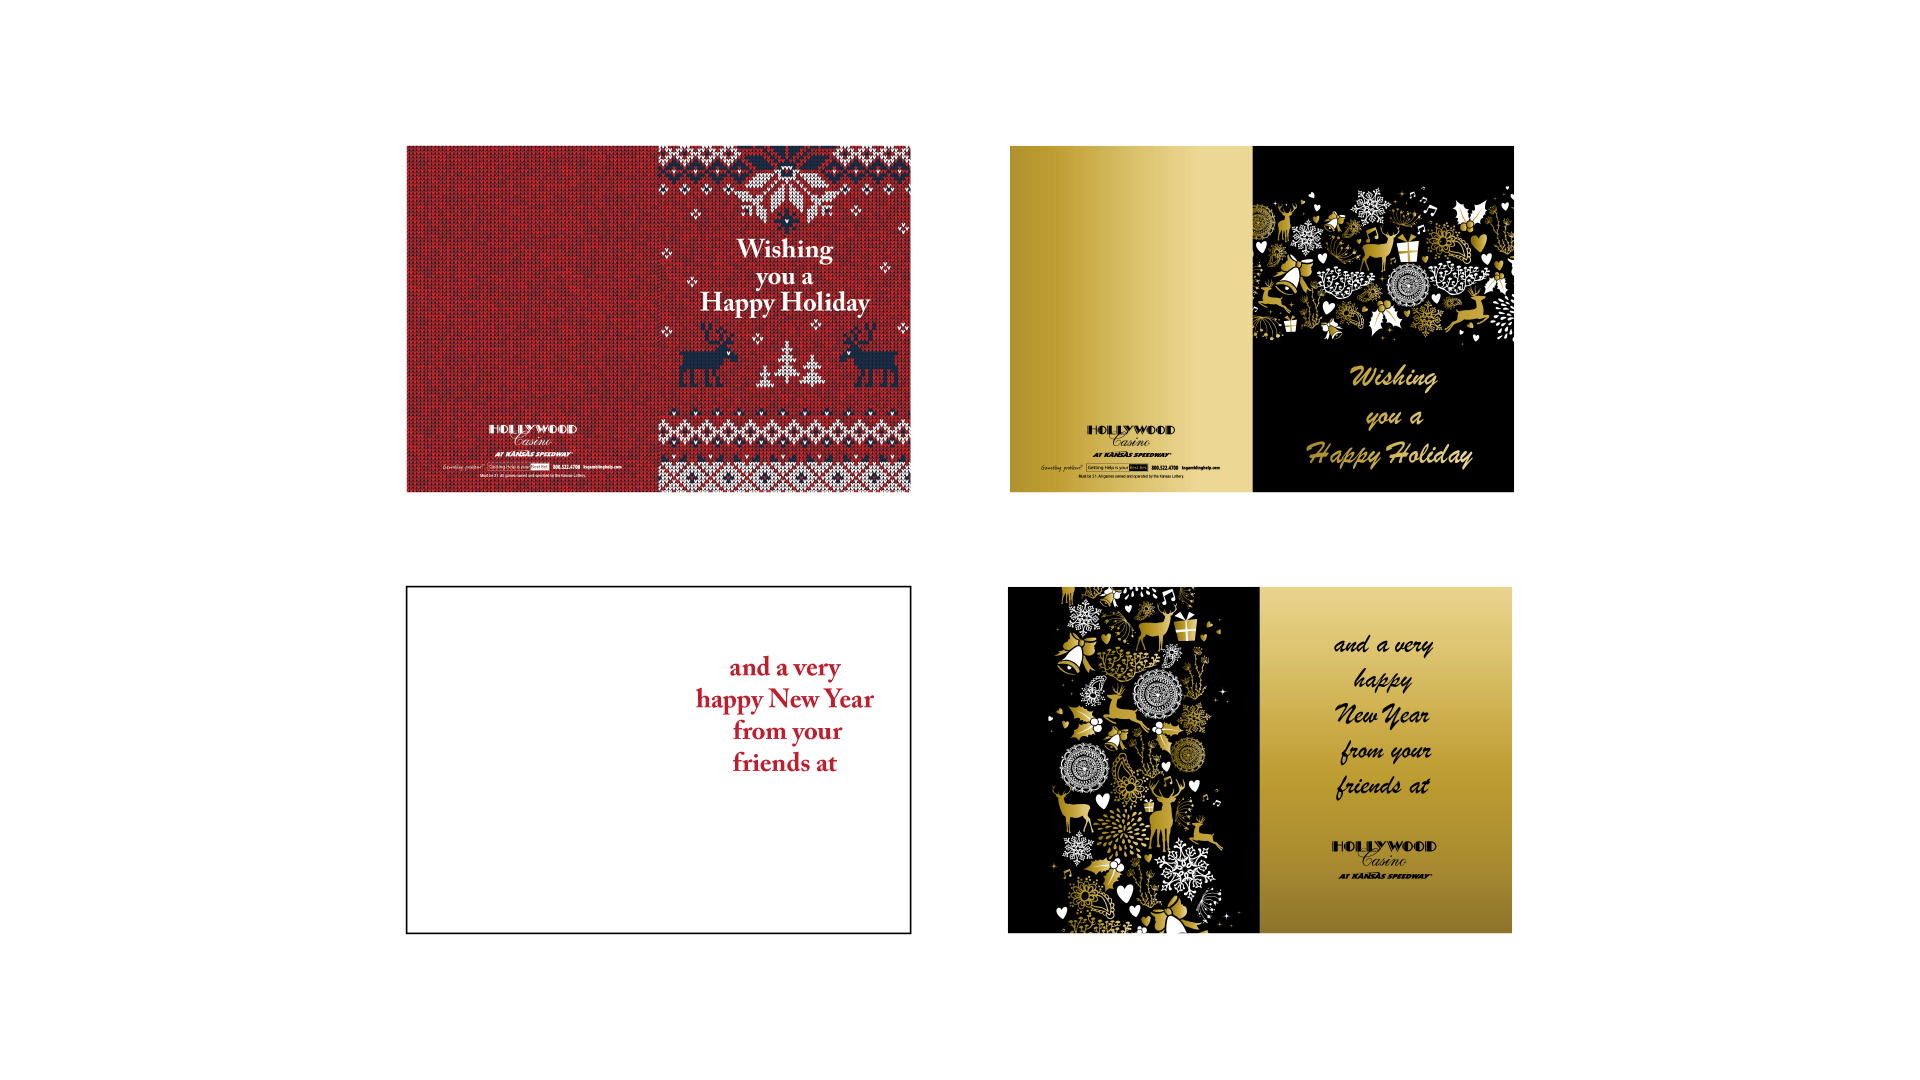 Hollywood Casino Holiday Cards